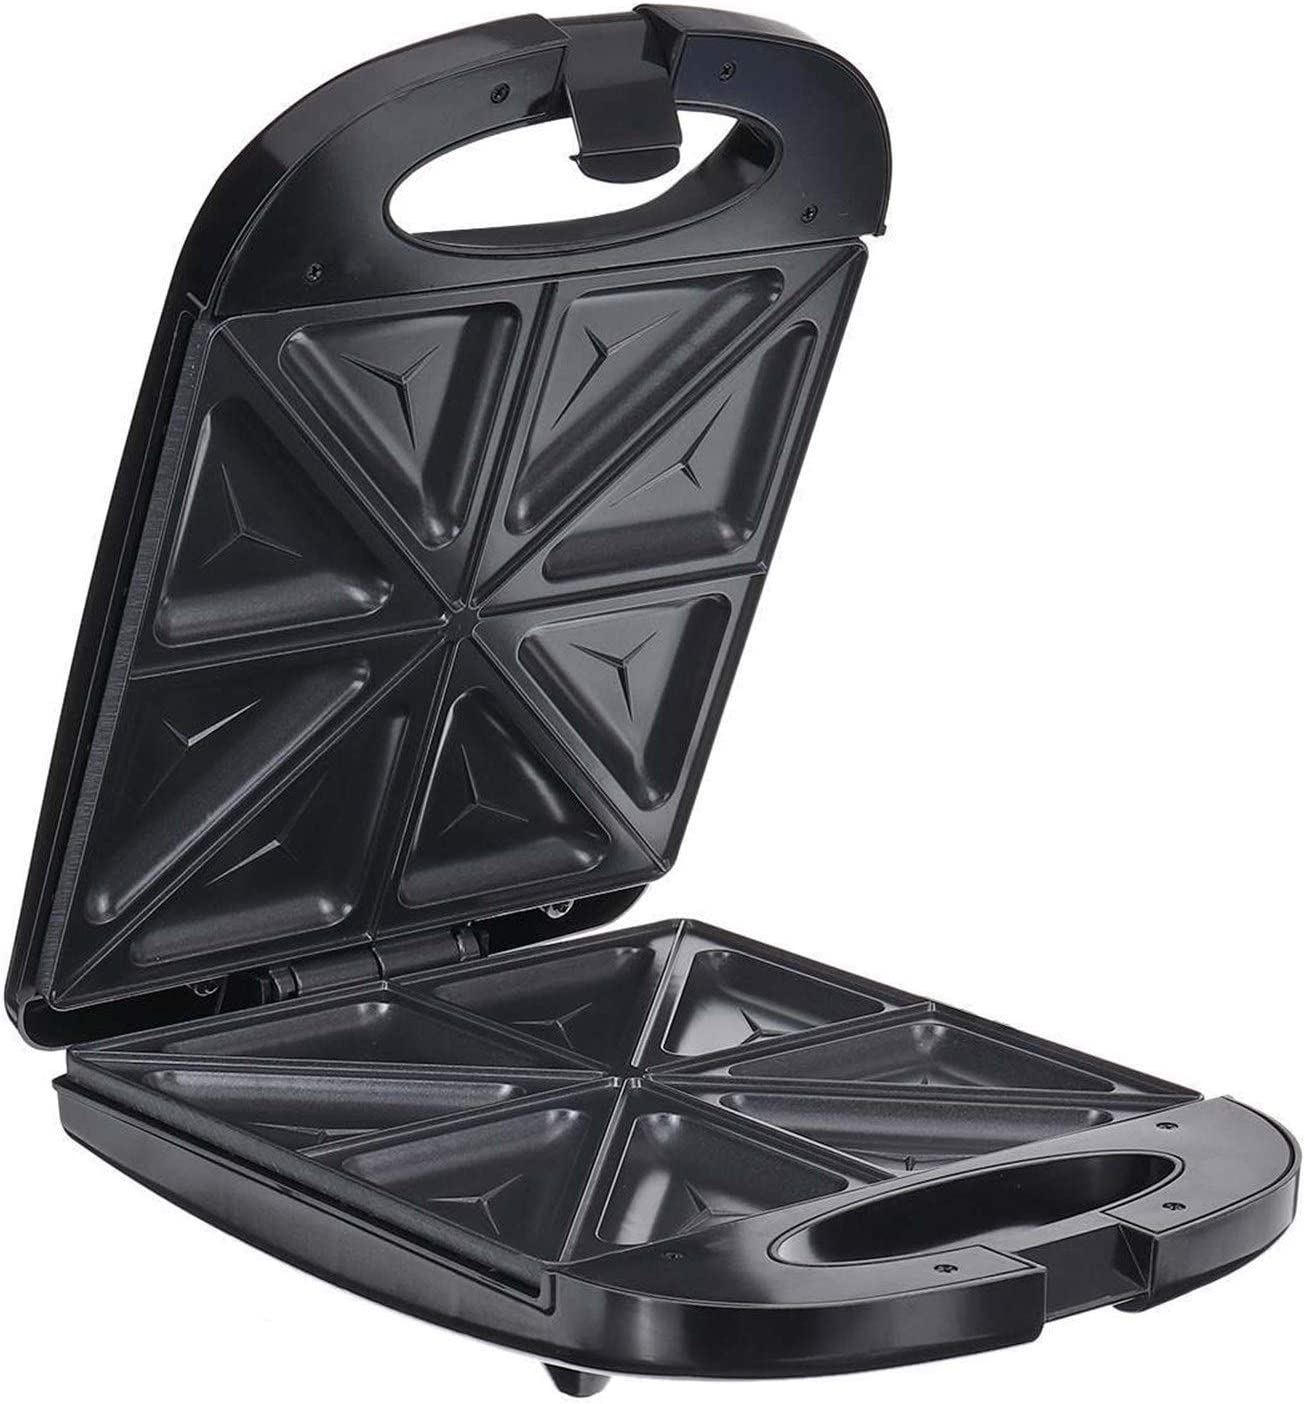 Cheap sale Breakfast Machine Dual Toast Grill Non Waffle Max 49% OFF Jaffle Stick Press